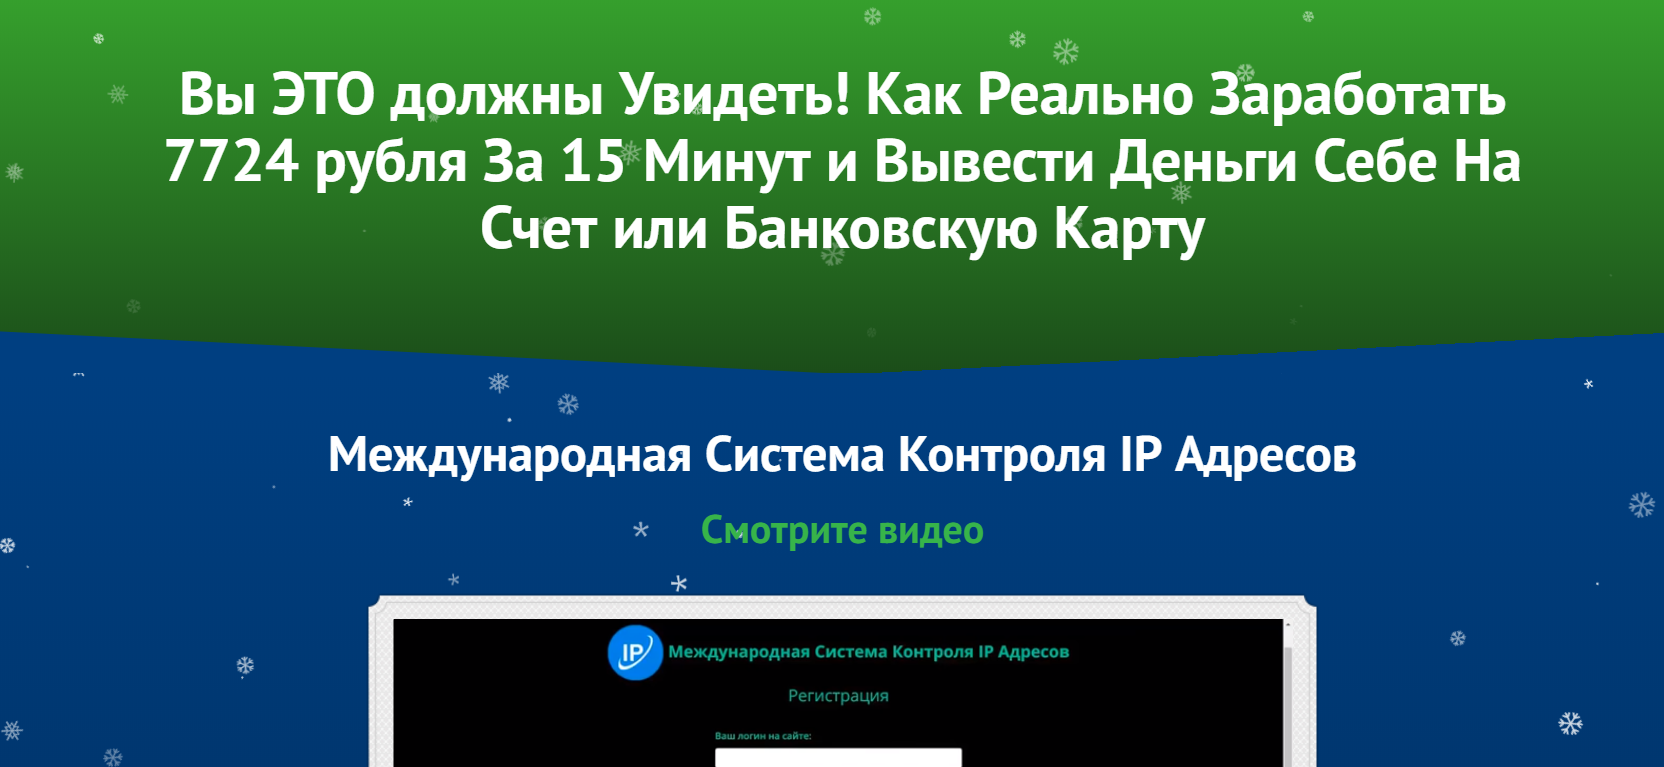 http://telegra.ph/file/d3ab703741d7870d0a706.png